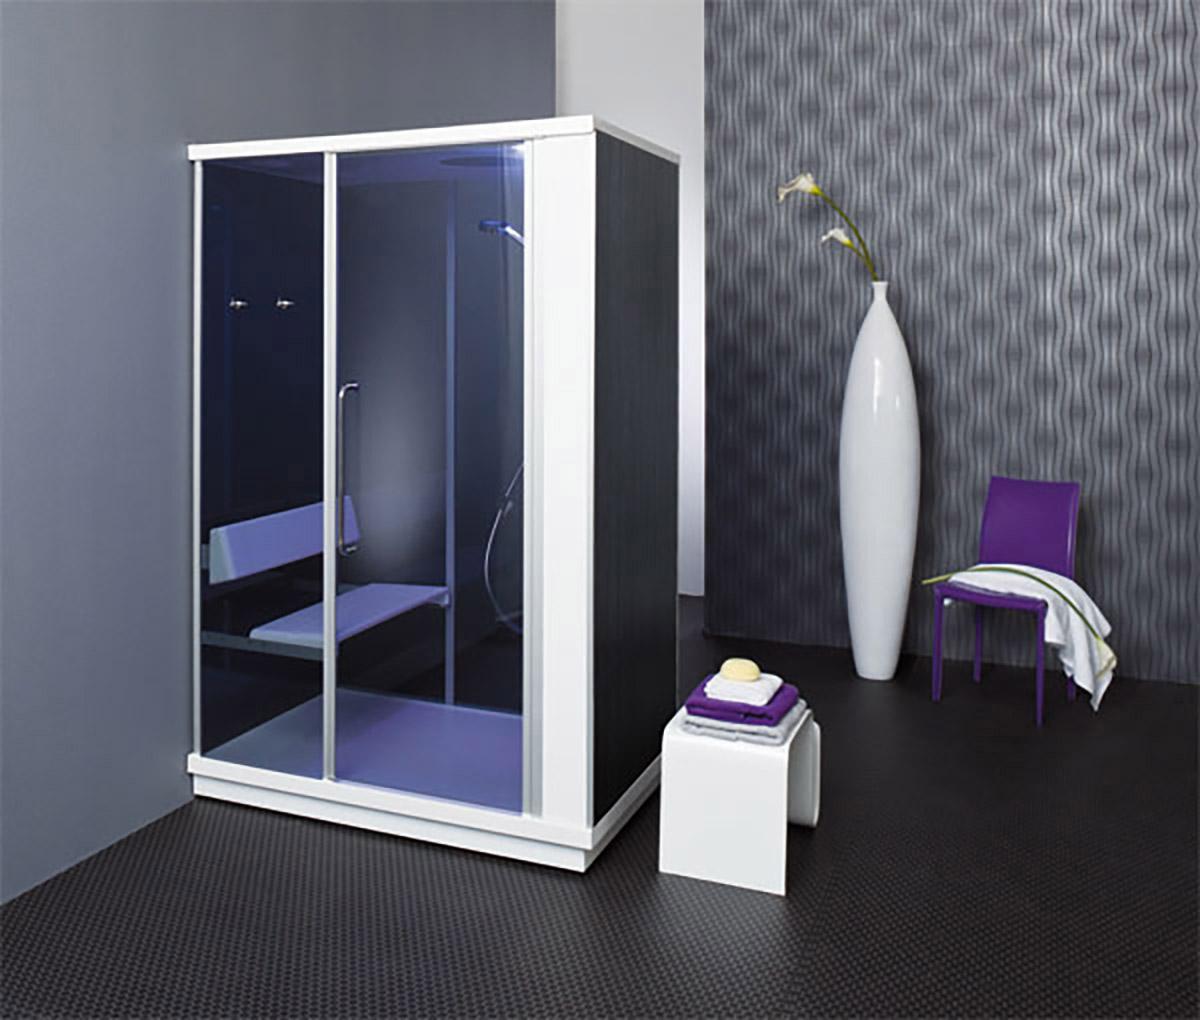 balteco tetris. Black Bedroom Furniture Sets. Home Design Ideas